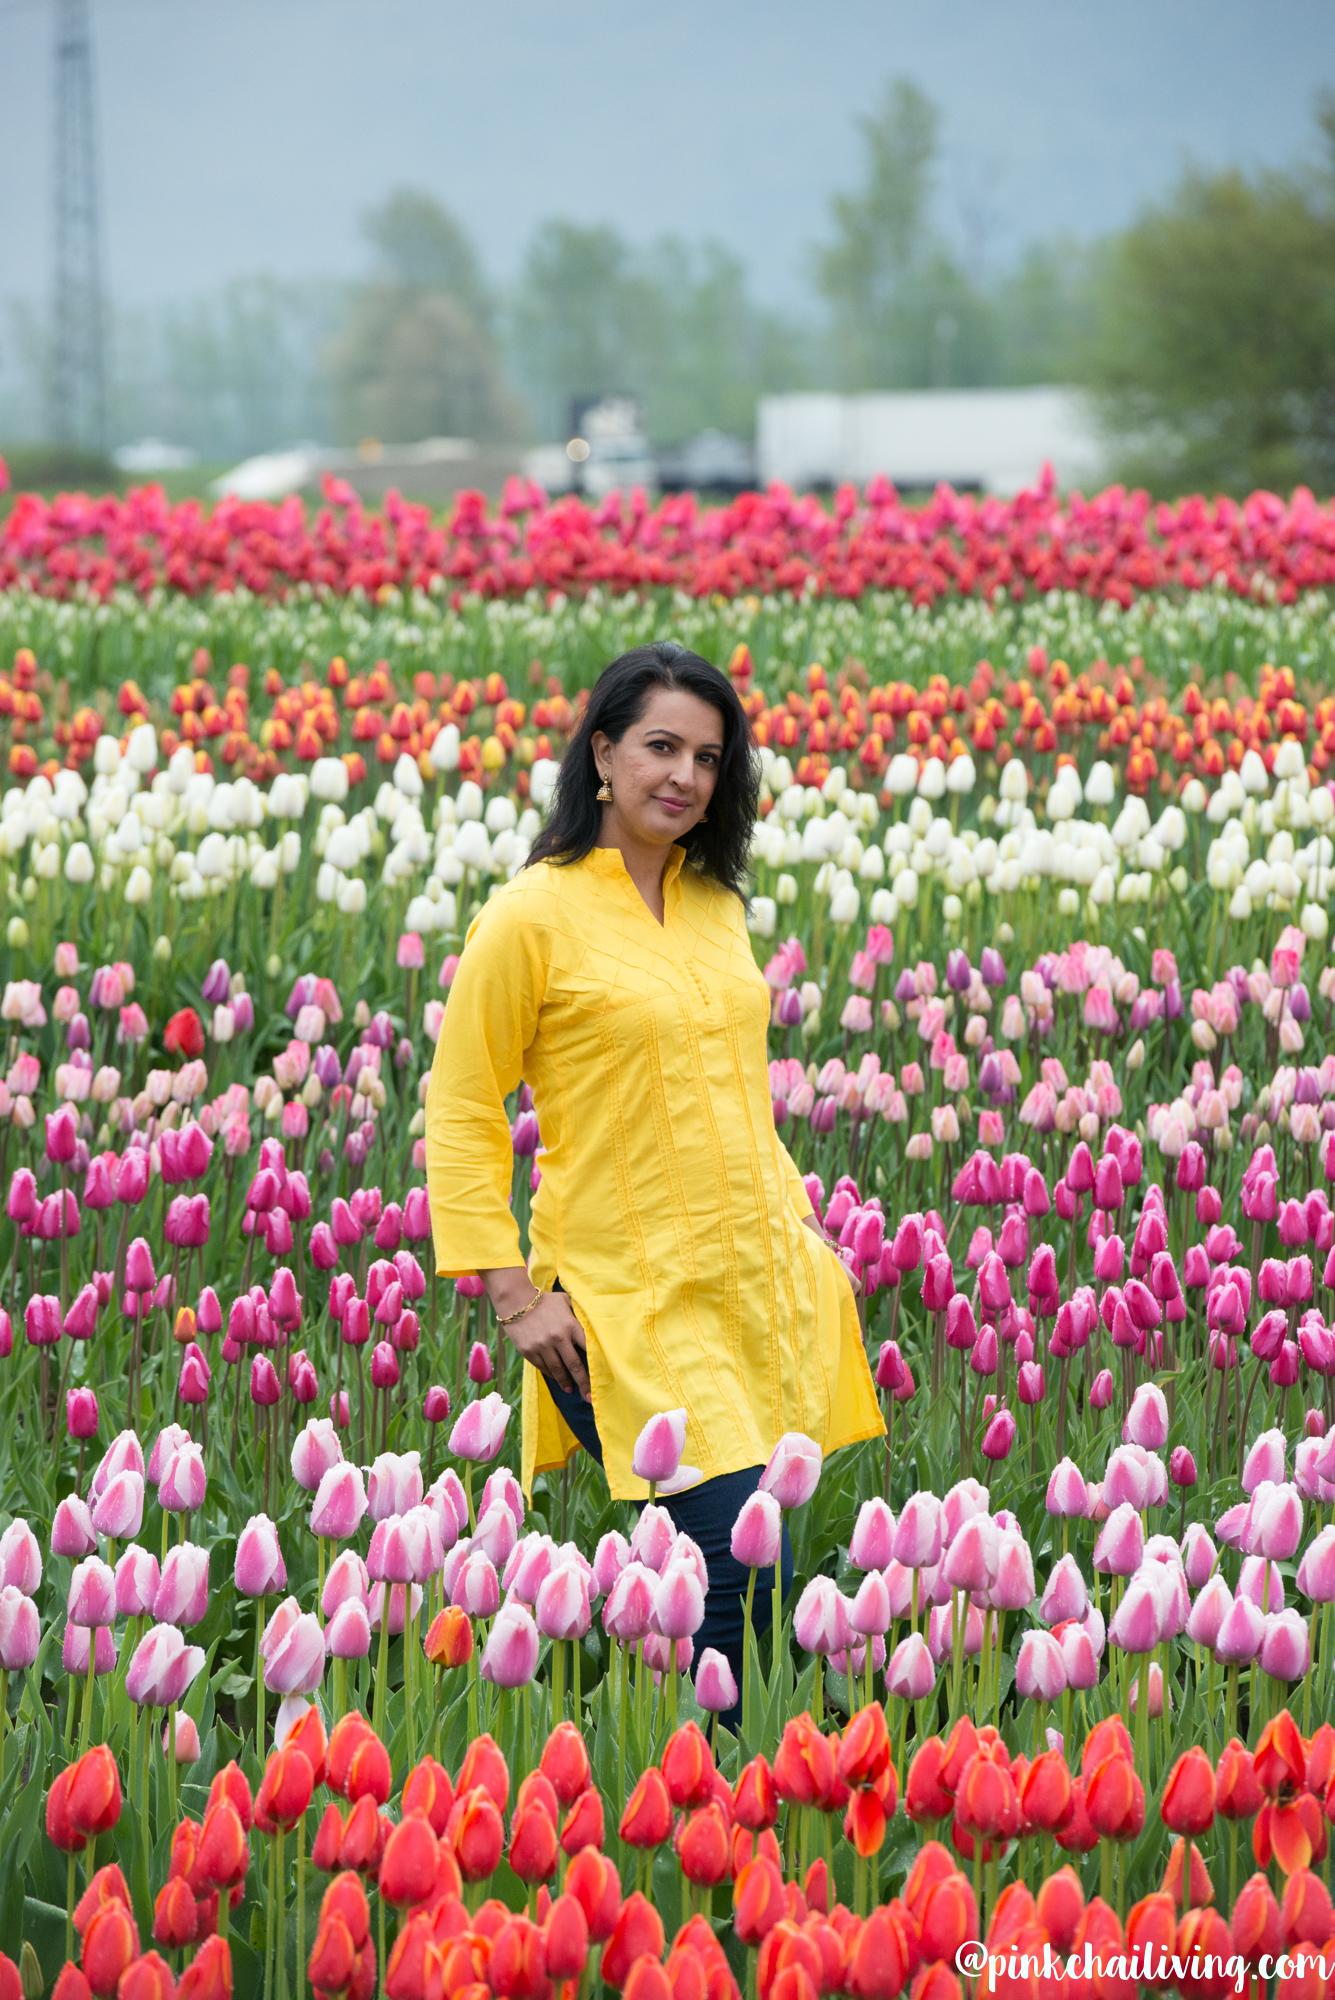 abbotsford bloom tulip festival 7